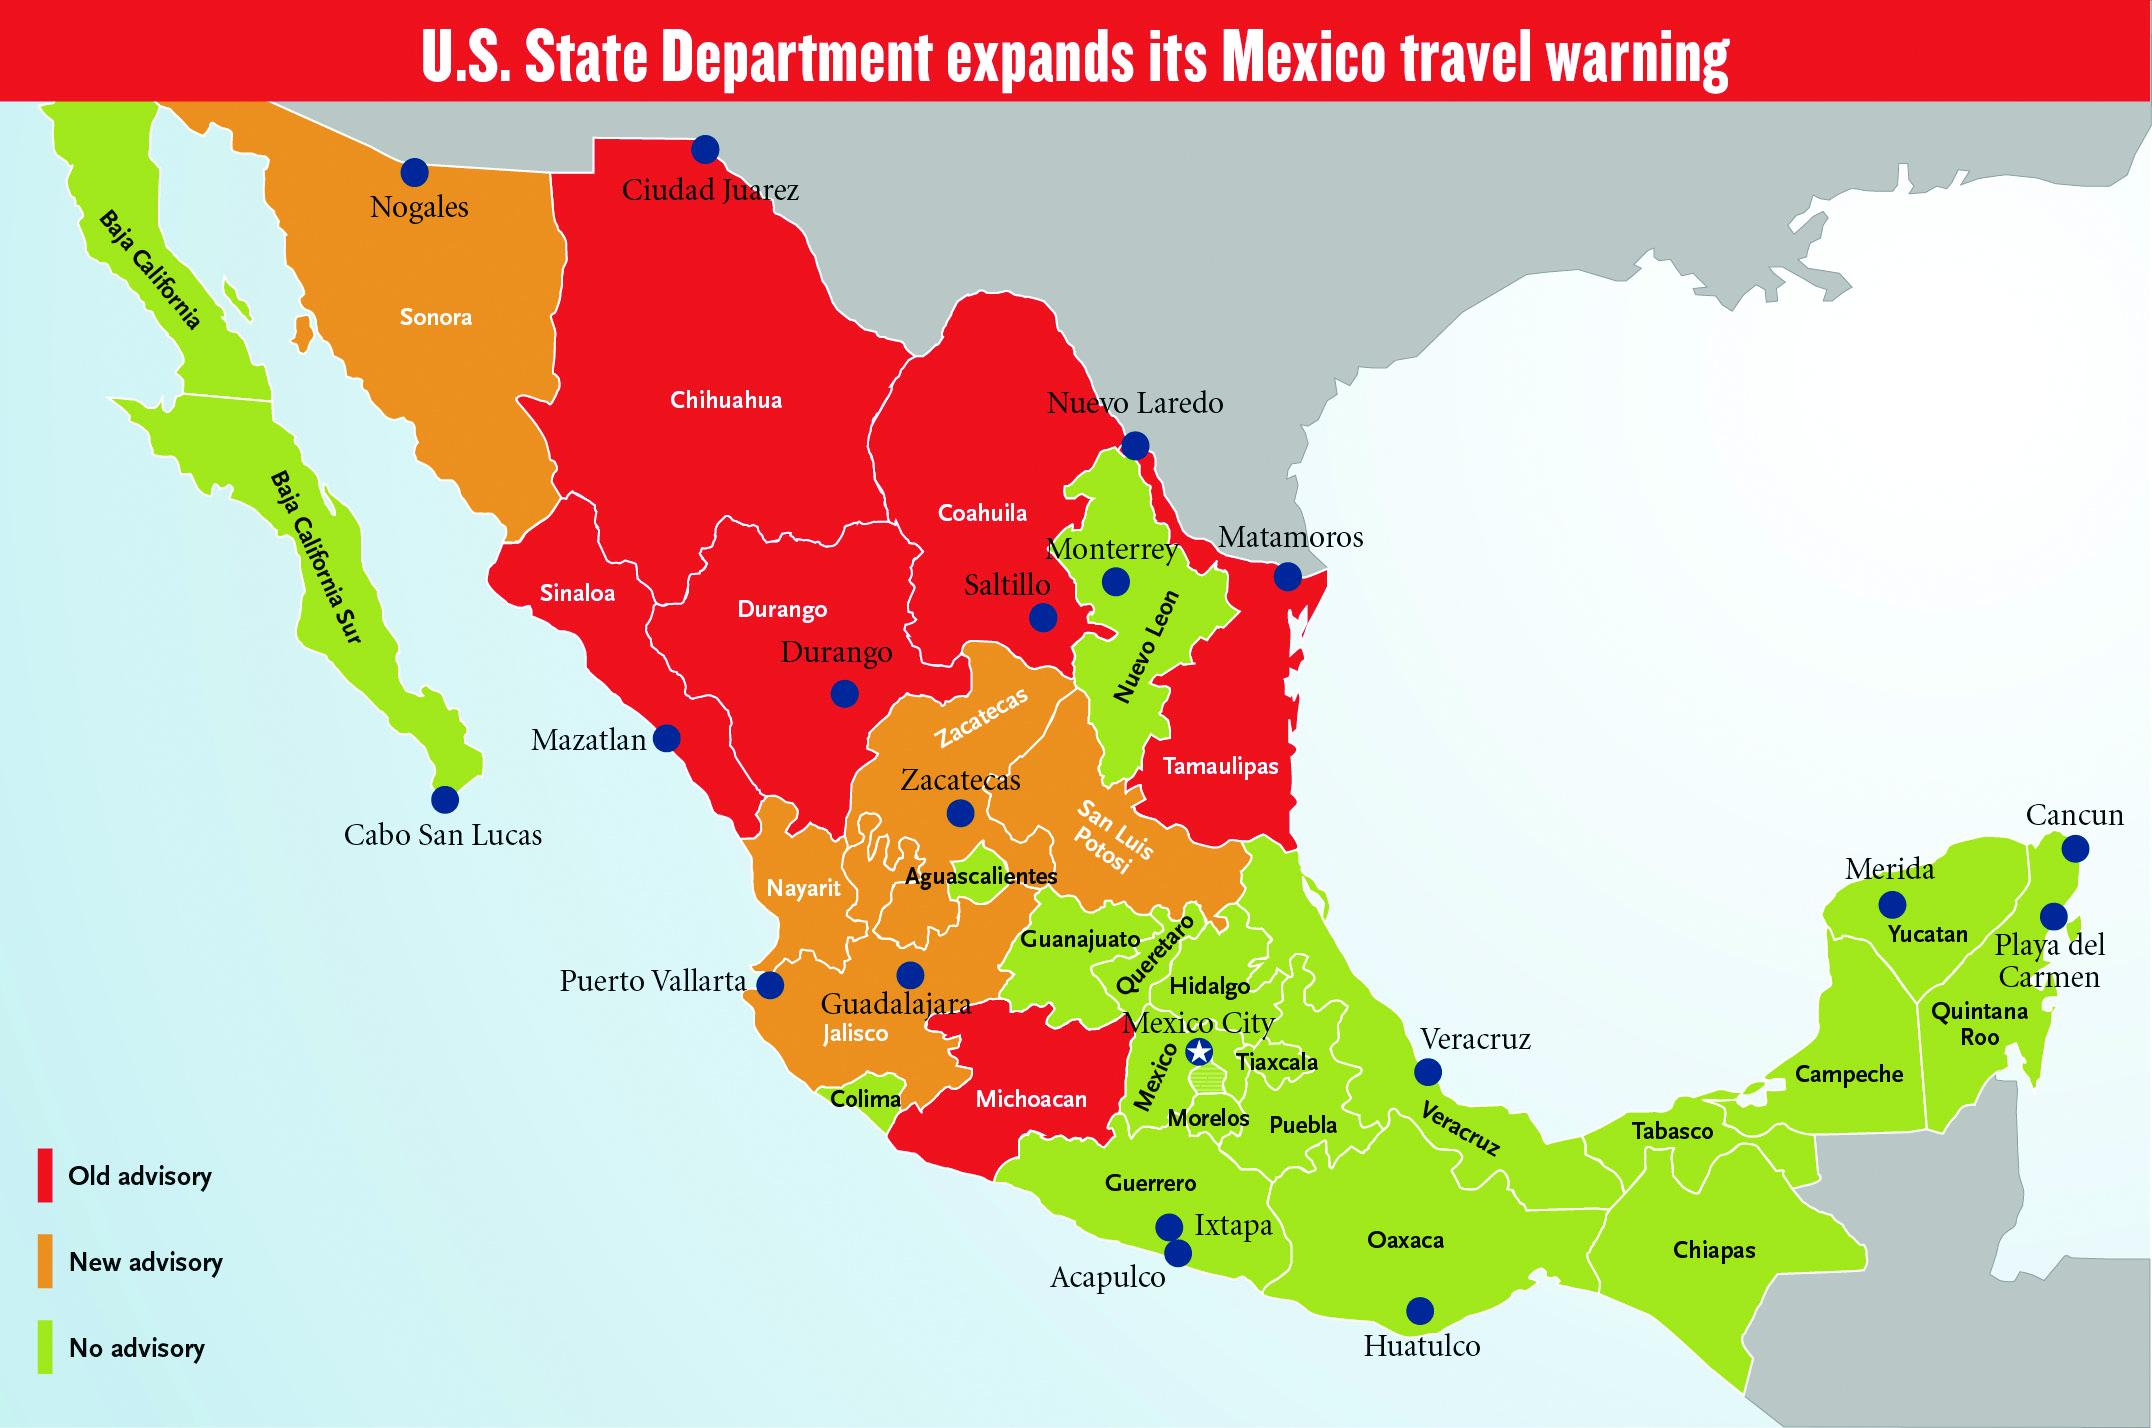 Mexico Travel Warning Map